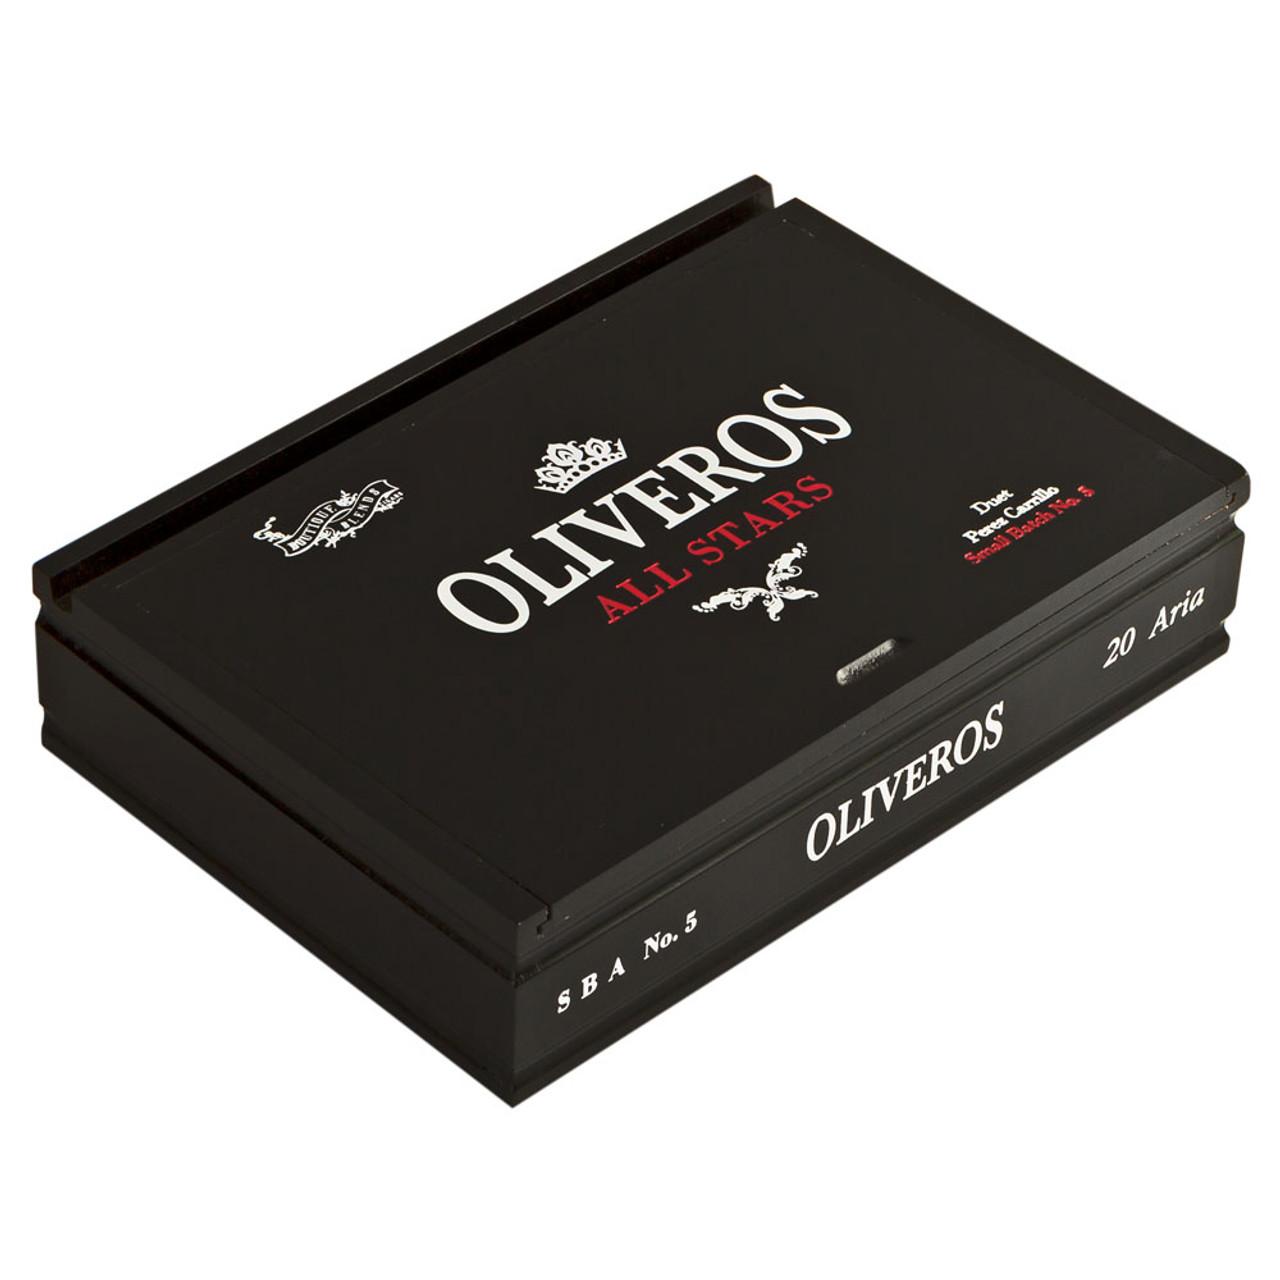 Oliveros All Stars #5 Fugue Cigars - 5.5 x 52 (Box of 20)